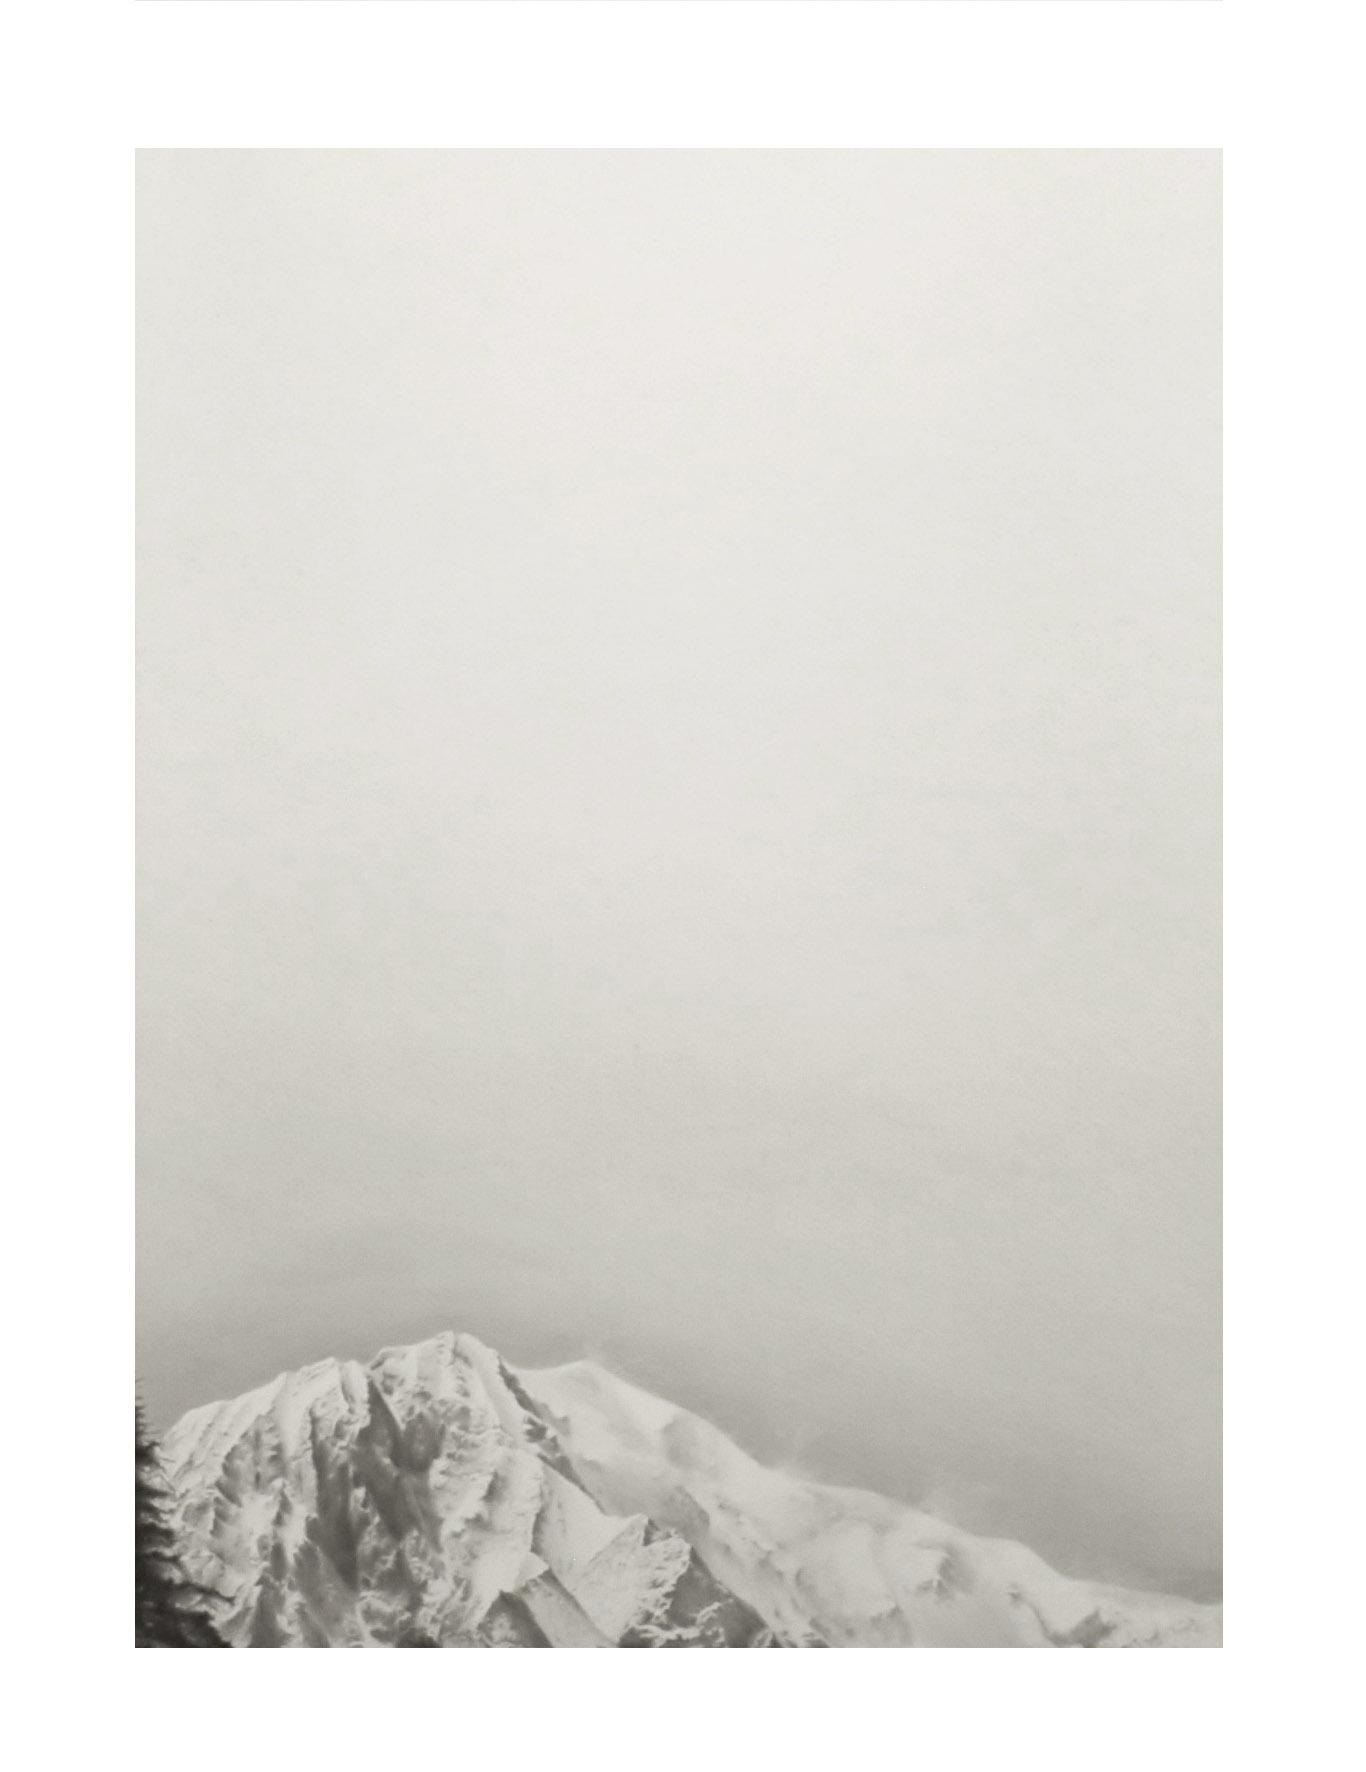 Mont Blanc # 2 (Detail)